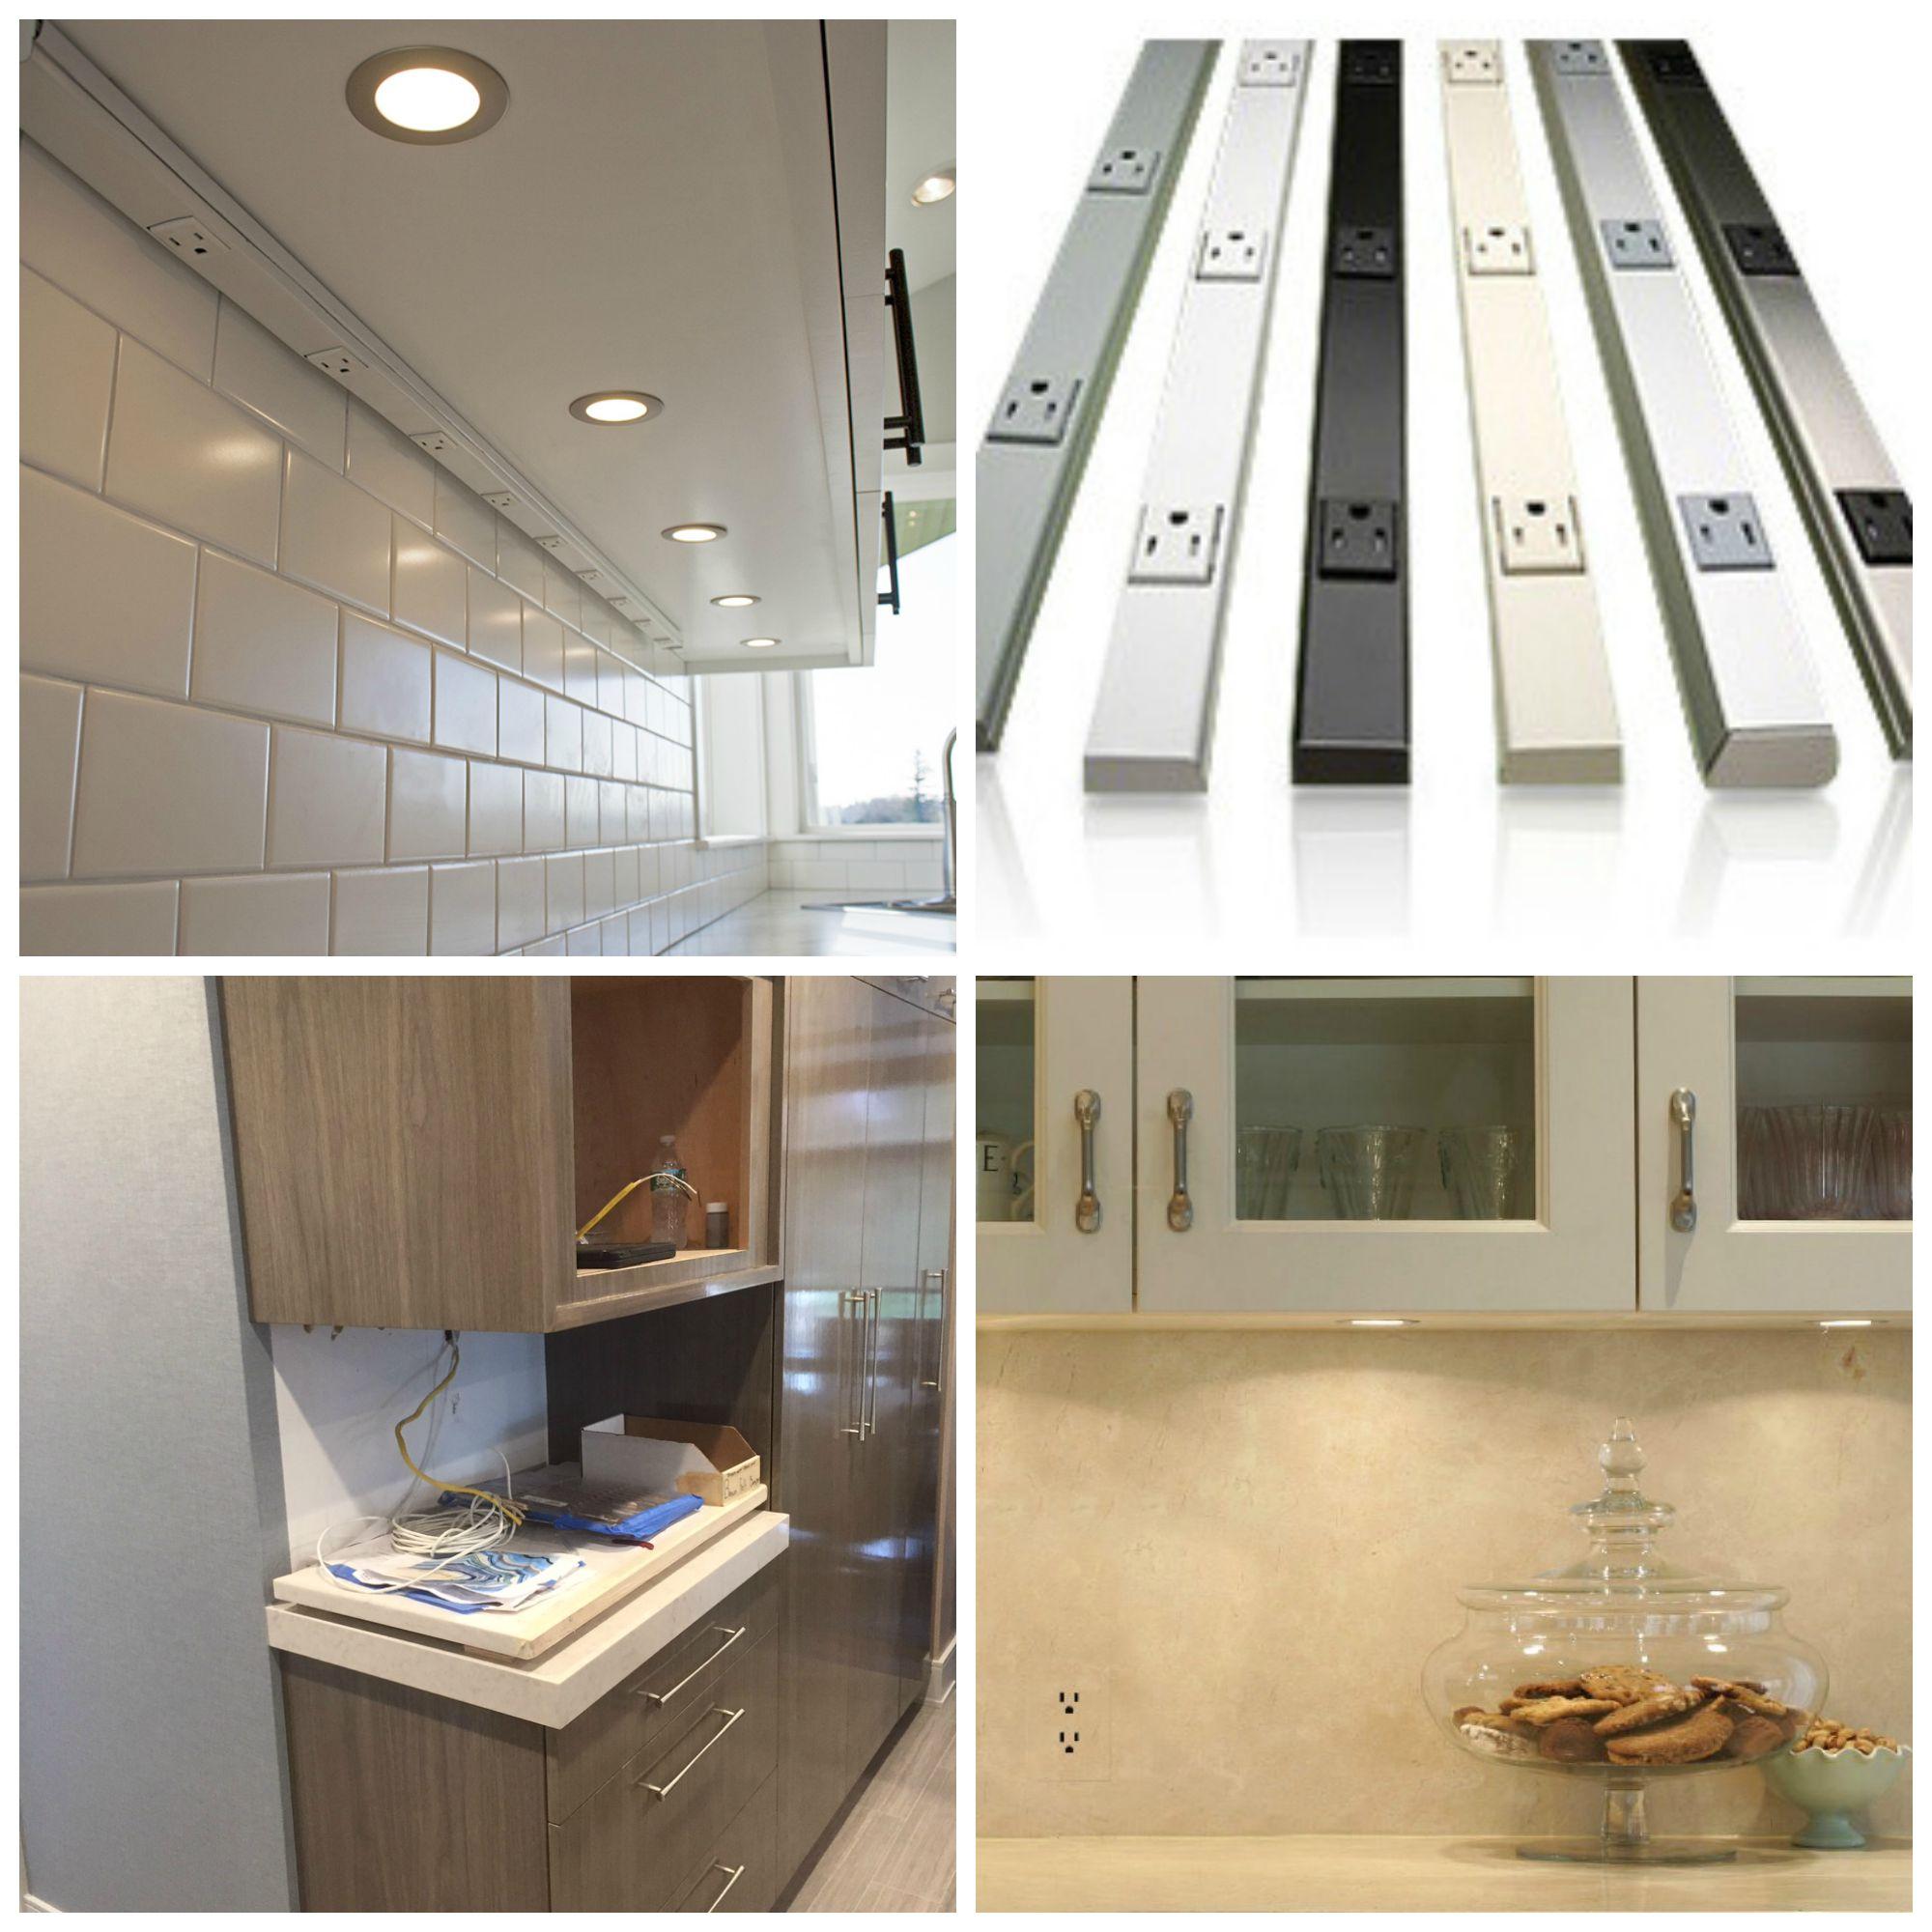 Inspiring Kitchen Kitchen remodel lighting